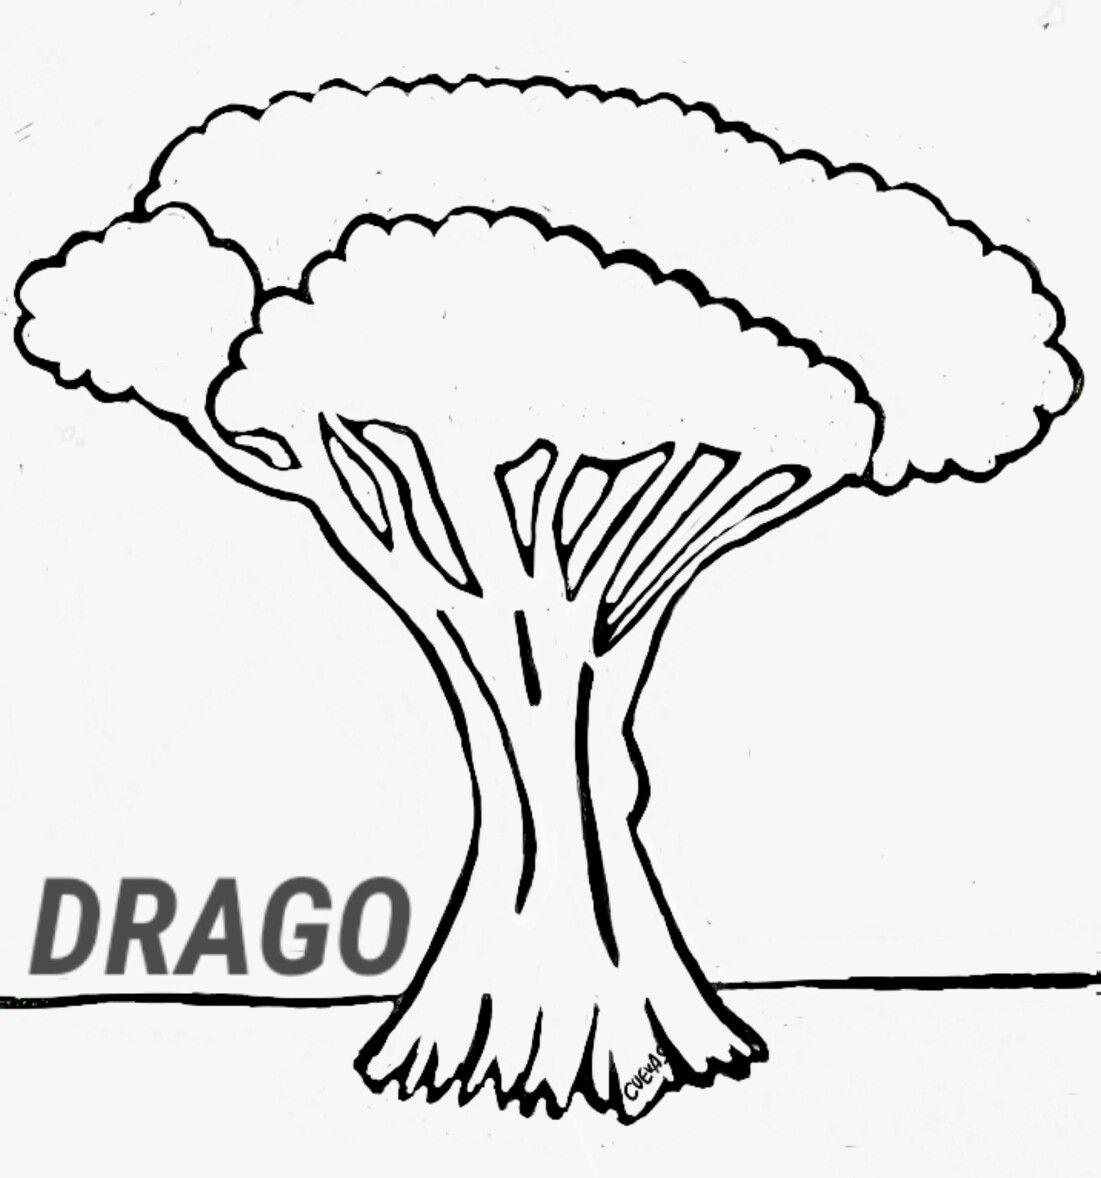 Drago Canarias Tipico Dia De Canarias Carne Mechada Un Dia